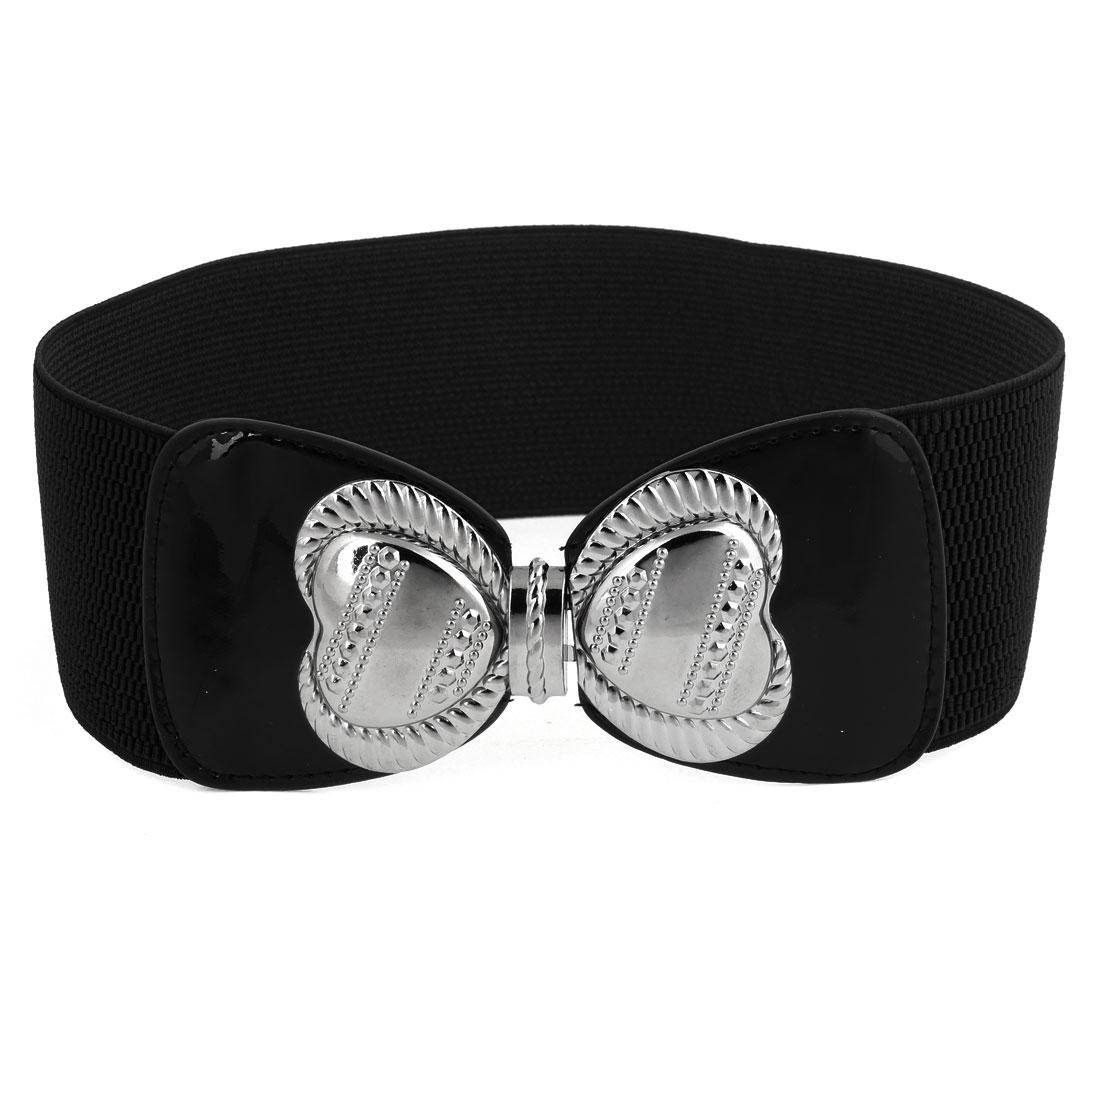 Woman Metal Bowknot Interlocking Closure Stretchy Belt 7.5cm Wide Black Gray